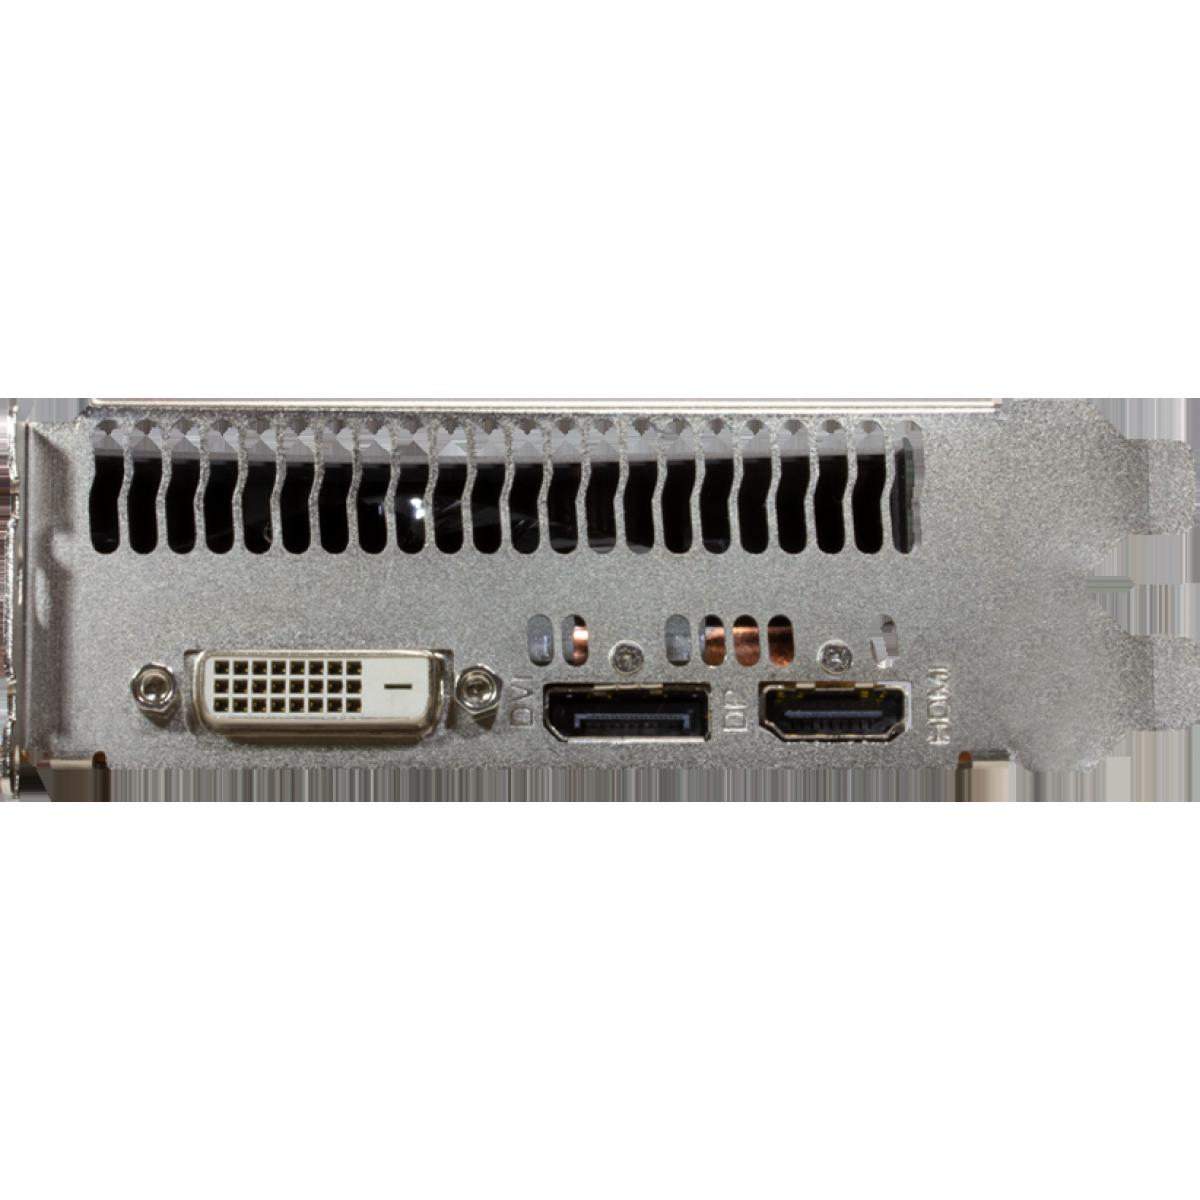 Placa de Vídeo PowerColor Radeon Navi RX 5500 XT, Dual Fan, 4GB GDDR6, 128Bit, AXRX5500XT 4GBD6-DH/OC